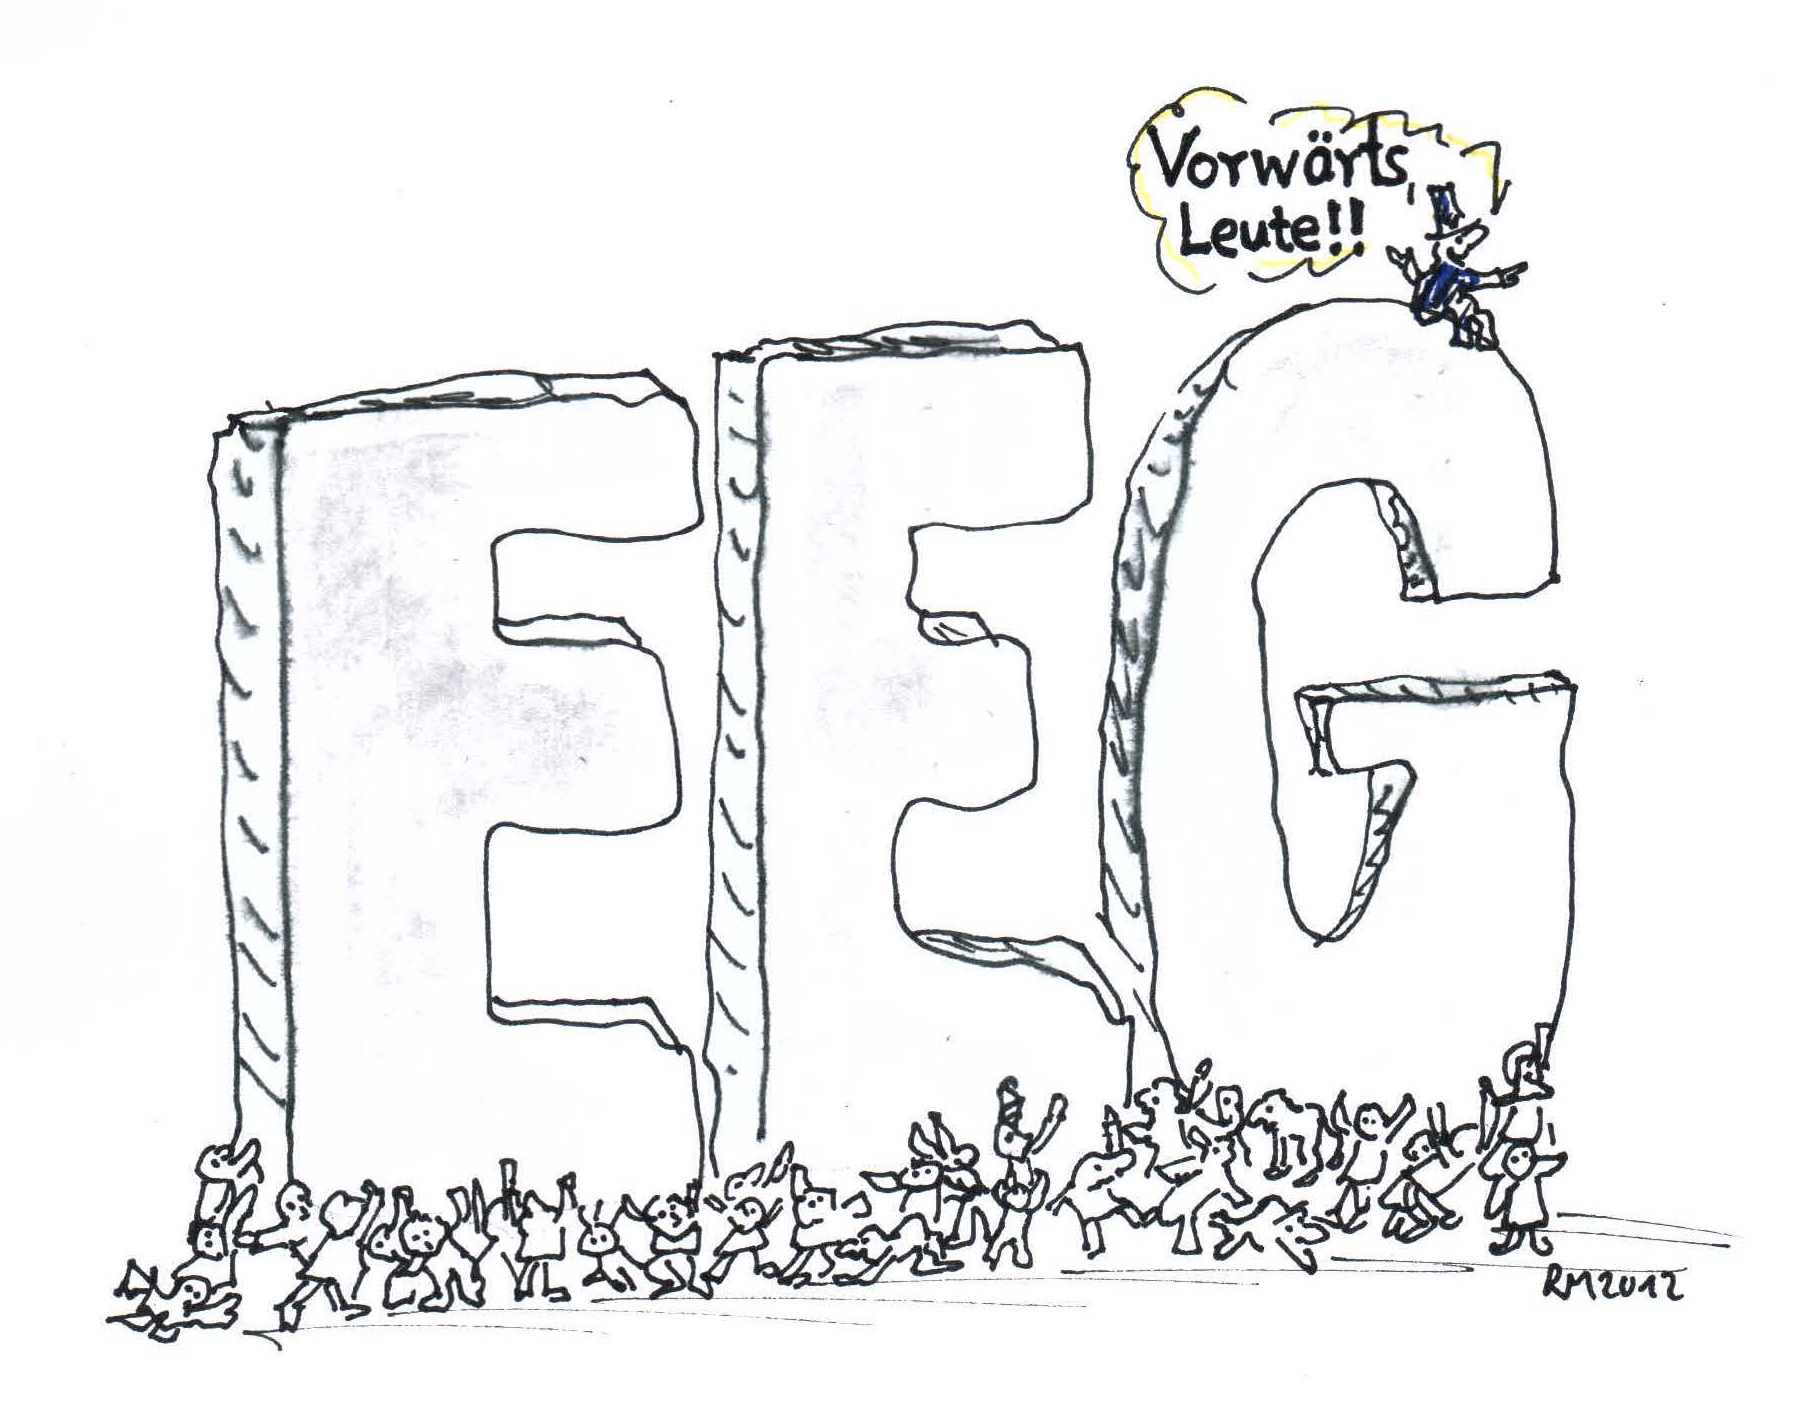 eeg cartoon pictures to pin on pinterest